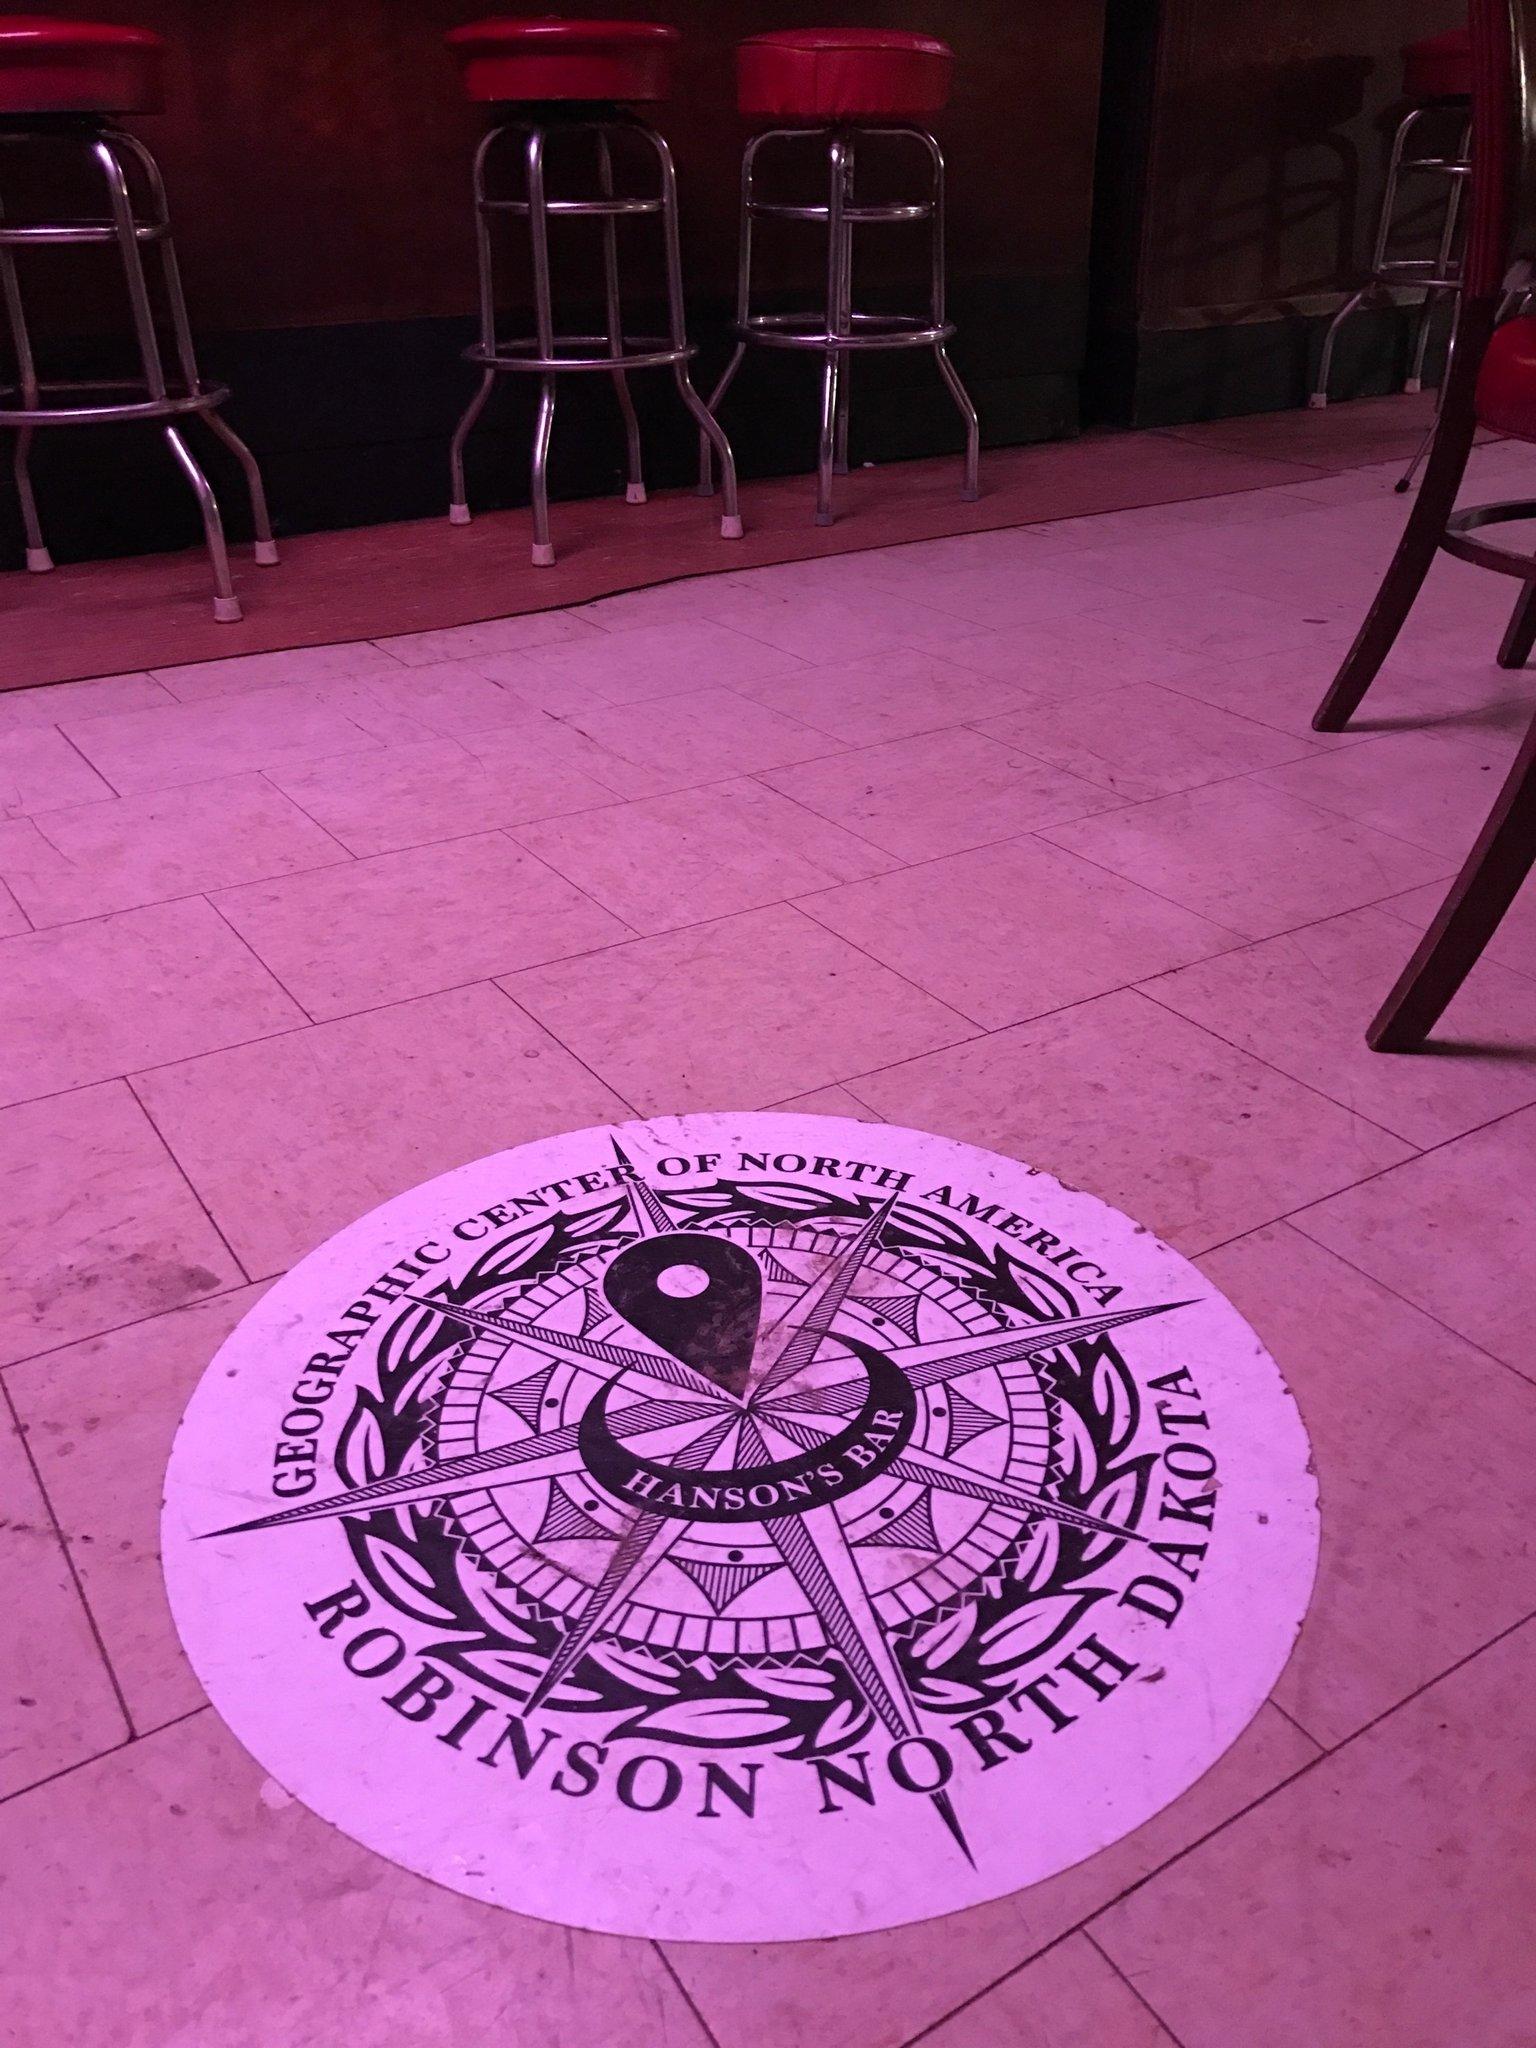 A decal on the floor of Hanson's Bar in Robinson, North Dakota.